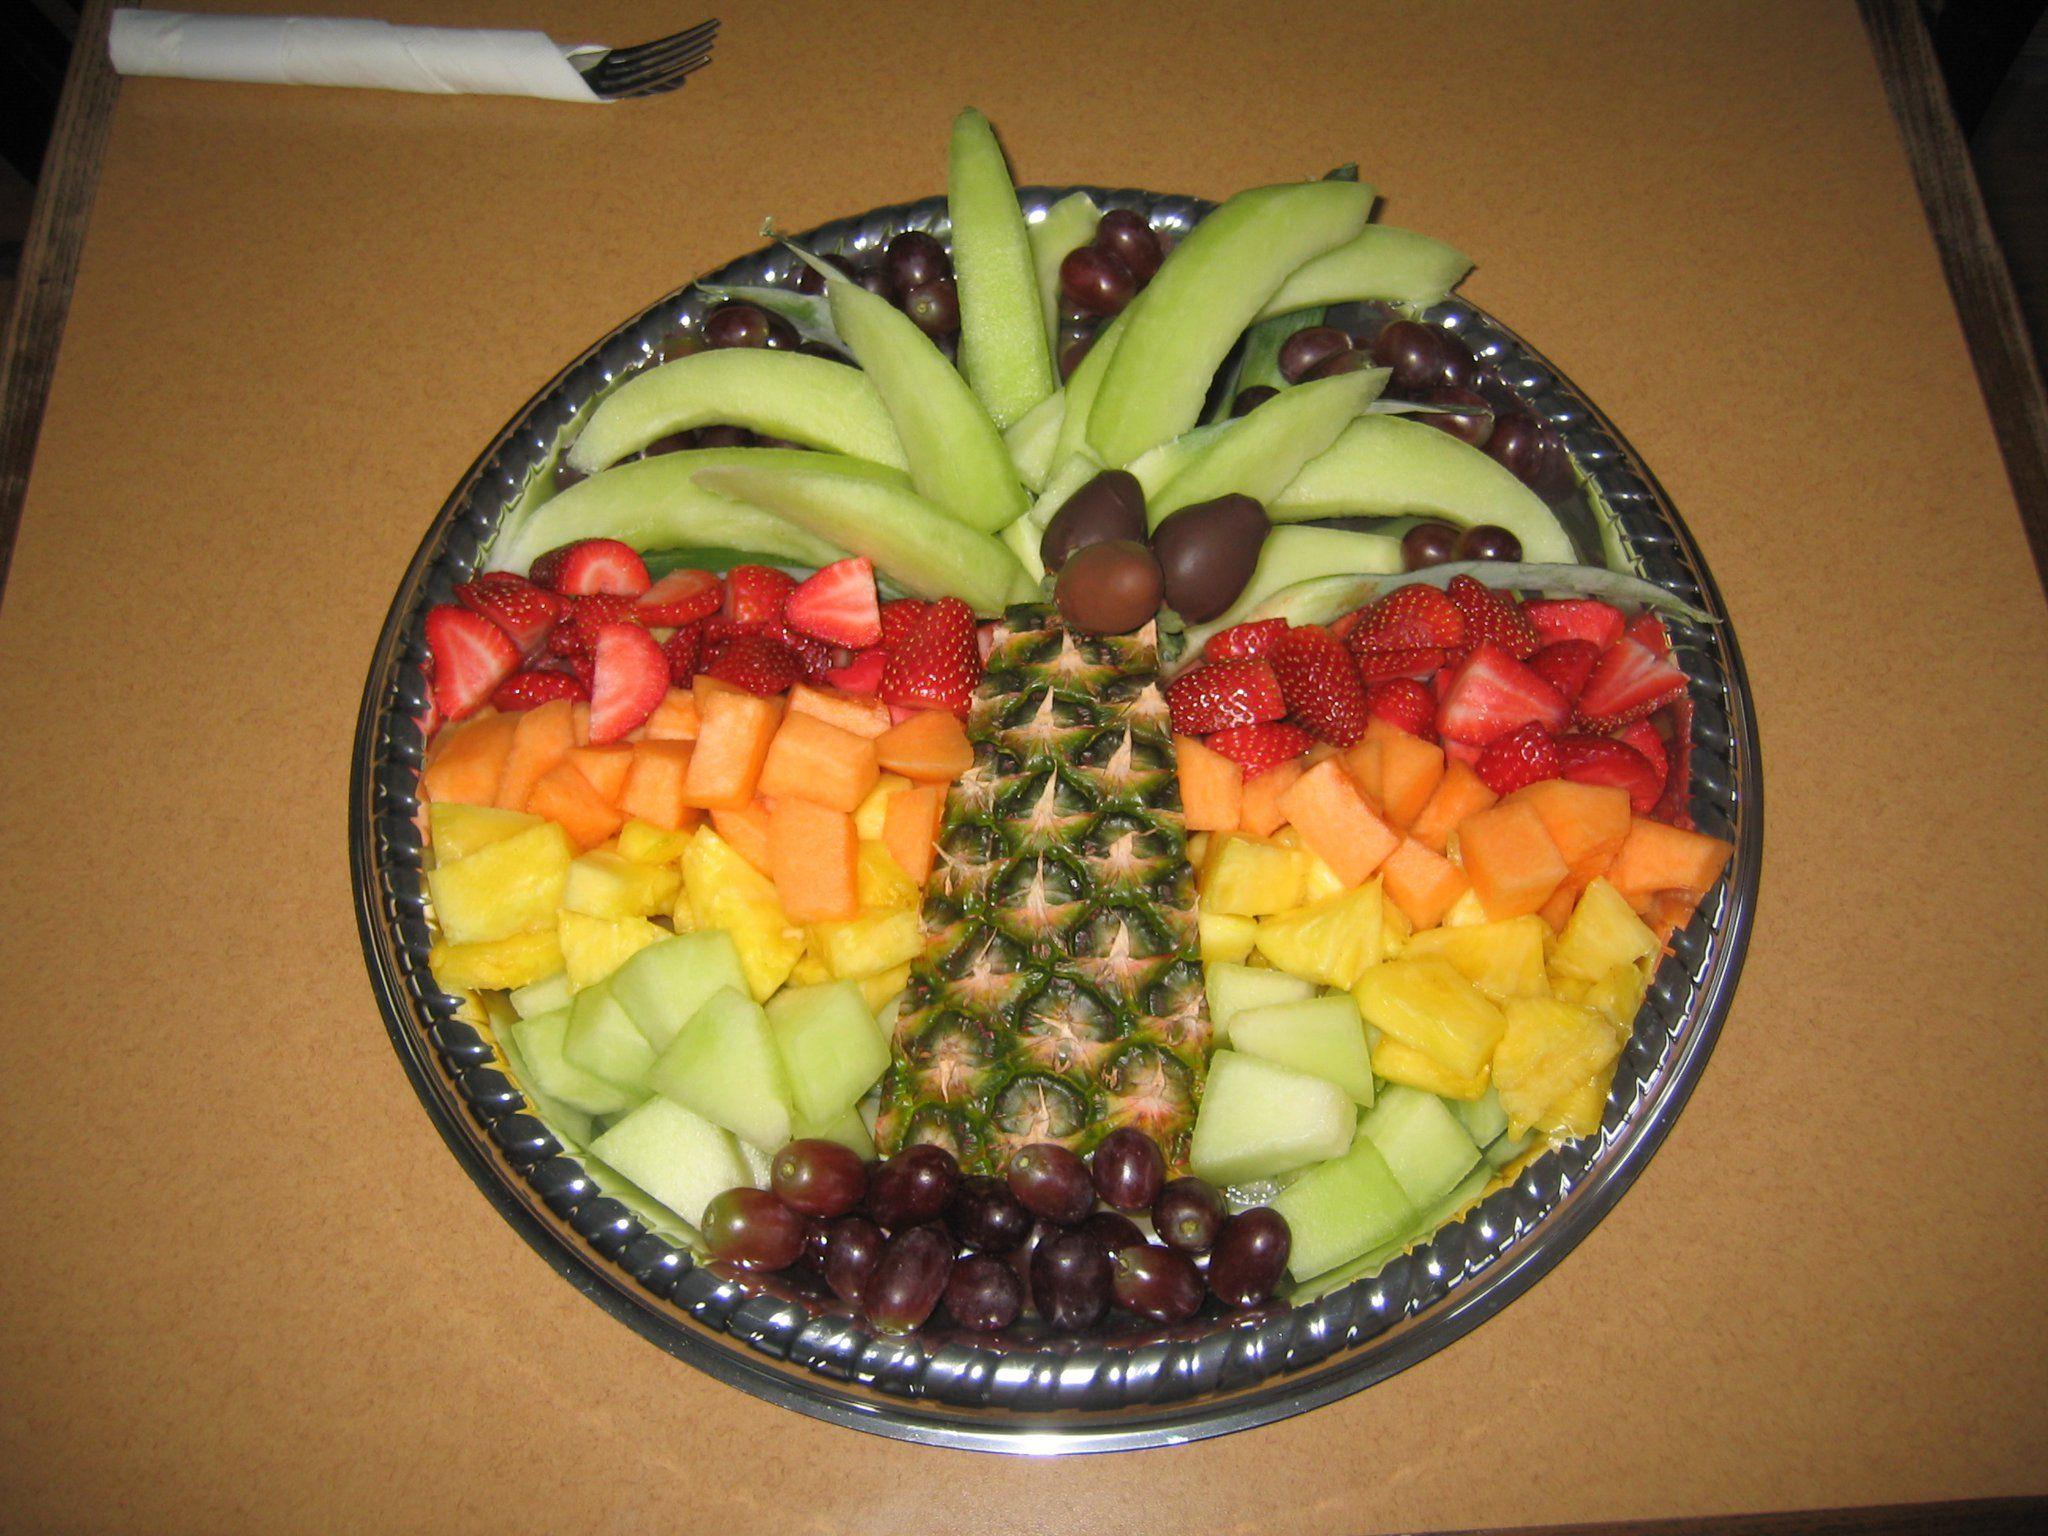 Fun fruit tray fun food pinterest fruit food and - Fruit decoration ...